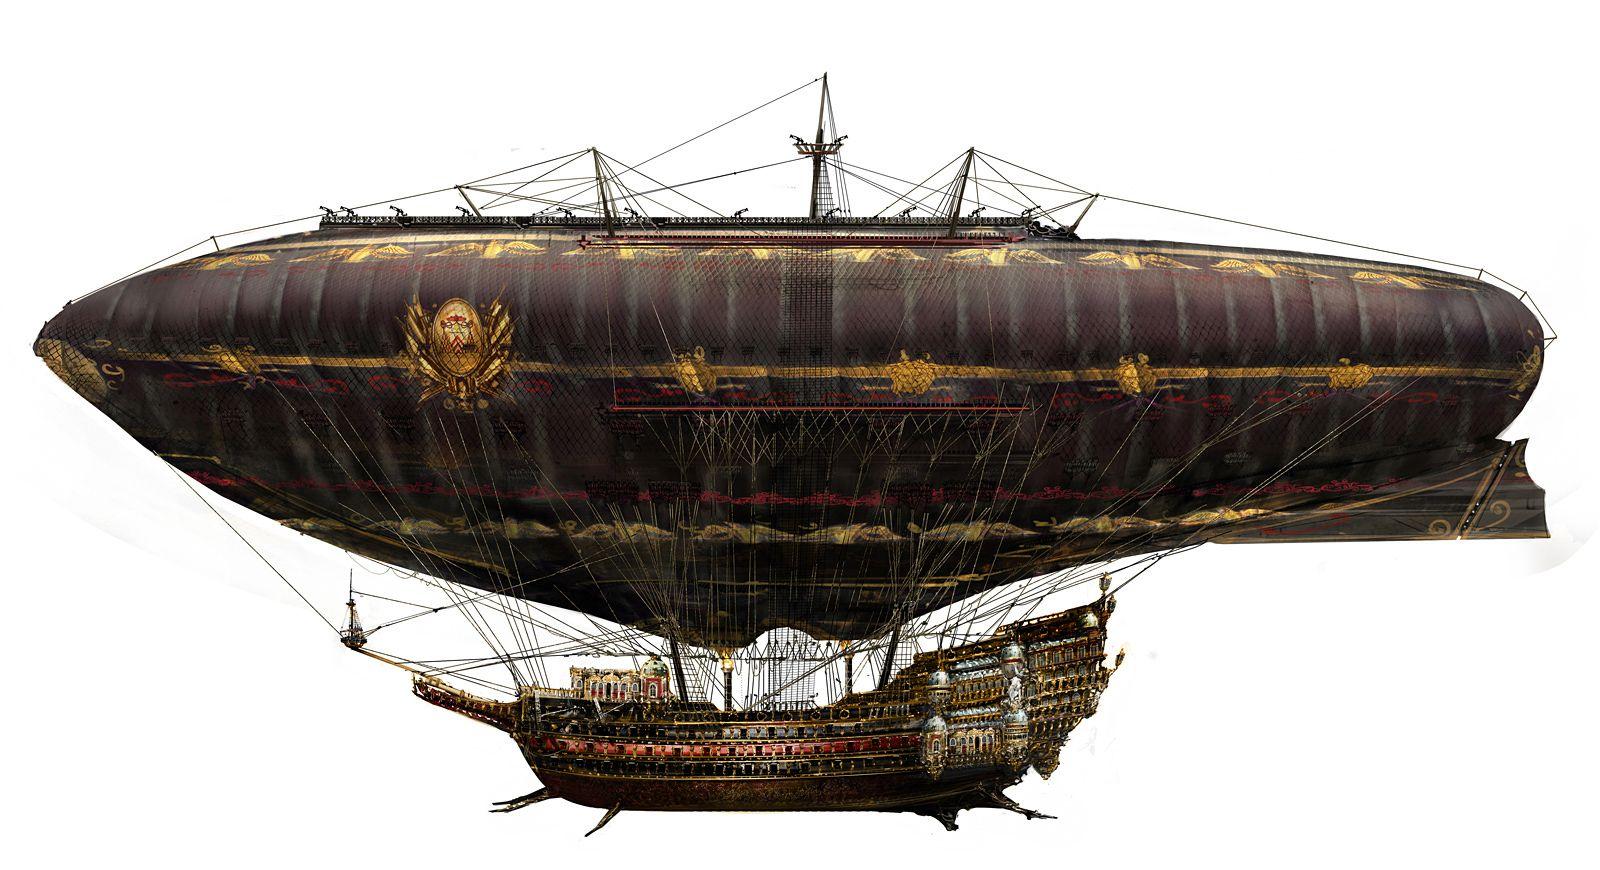 Steampunk Airships - Google Art